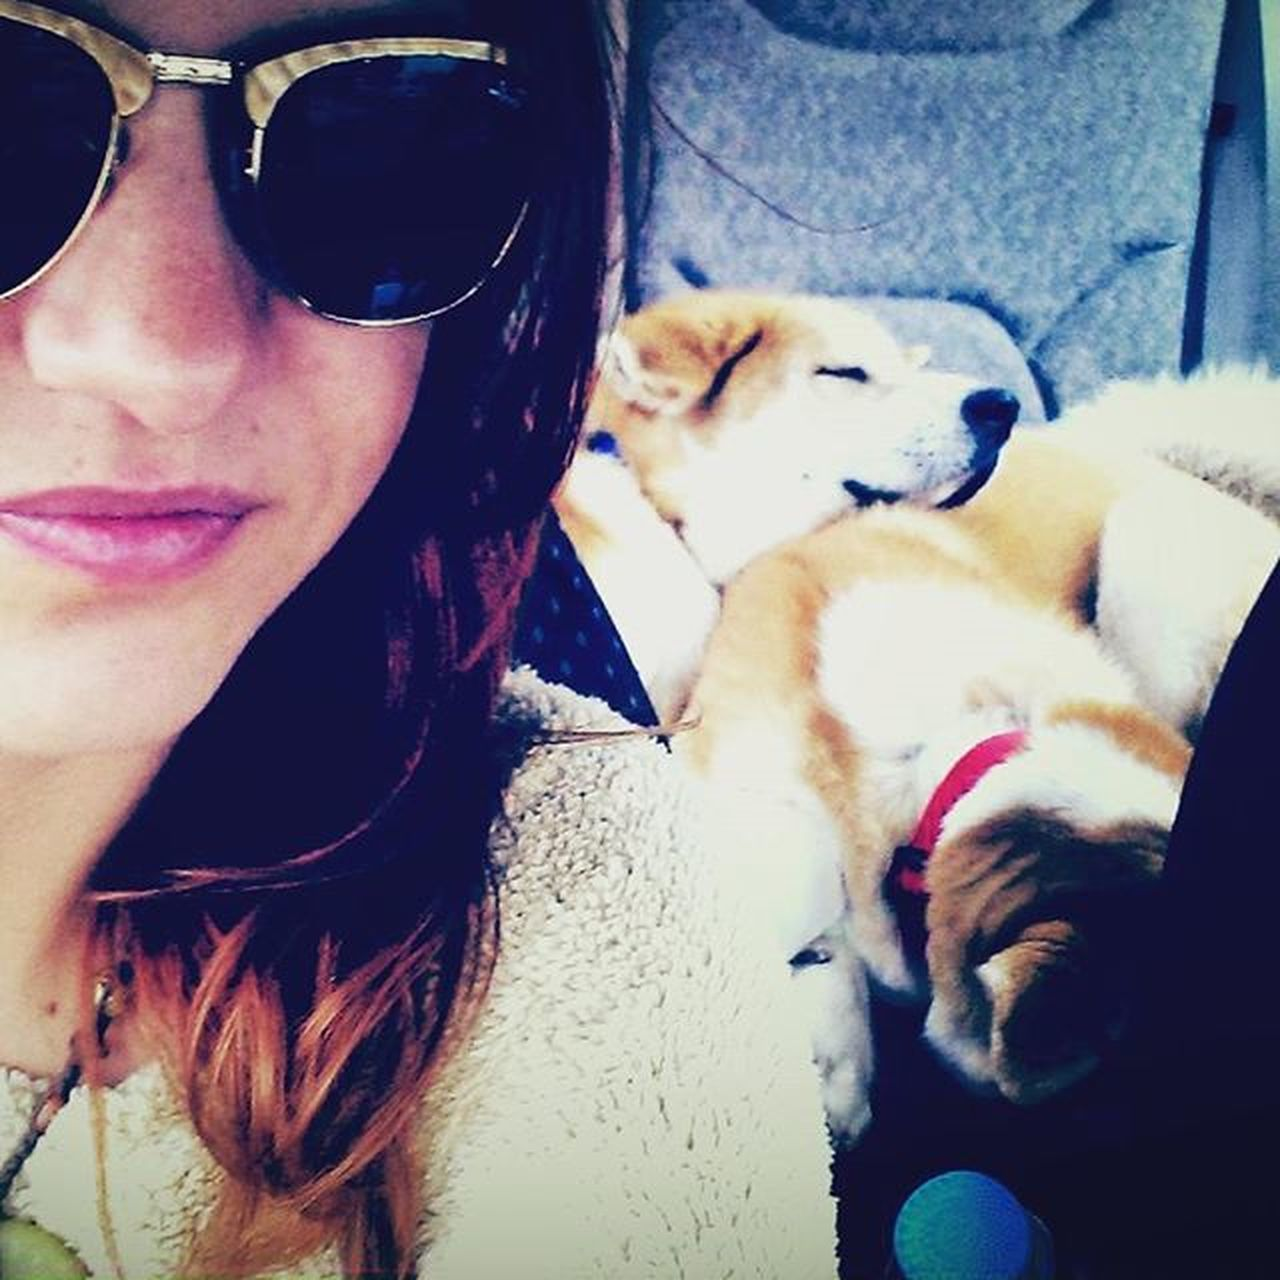 Dog Akitas Akitainu  Hachiko AKA Taramae Tara CarRide Naptime Pups Socute JapaneseAkita Japaneseakitainu Cute Cuddle Cuddletime Siblings